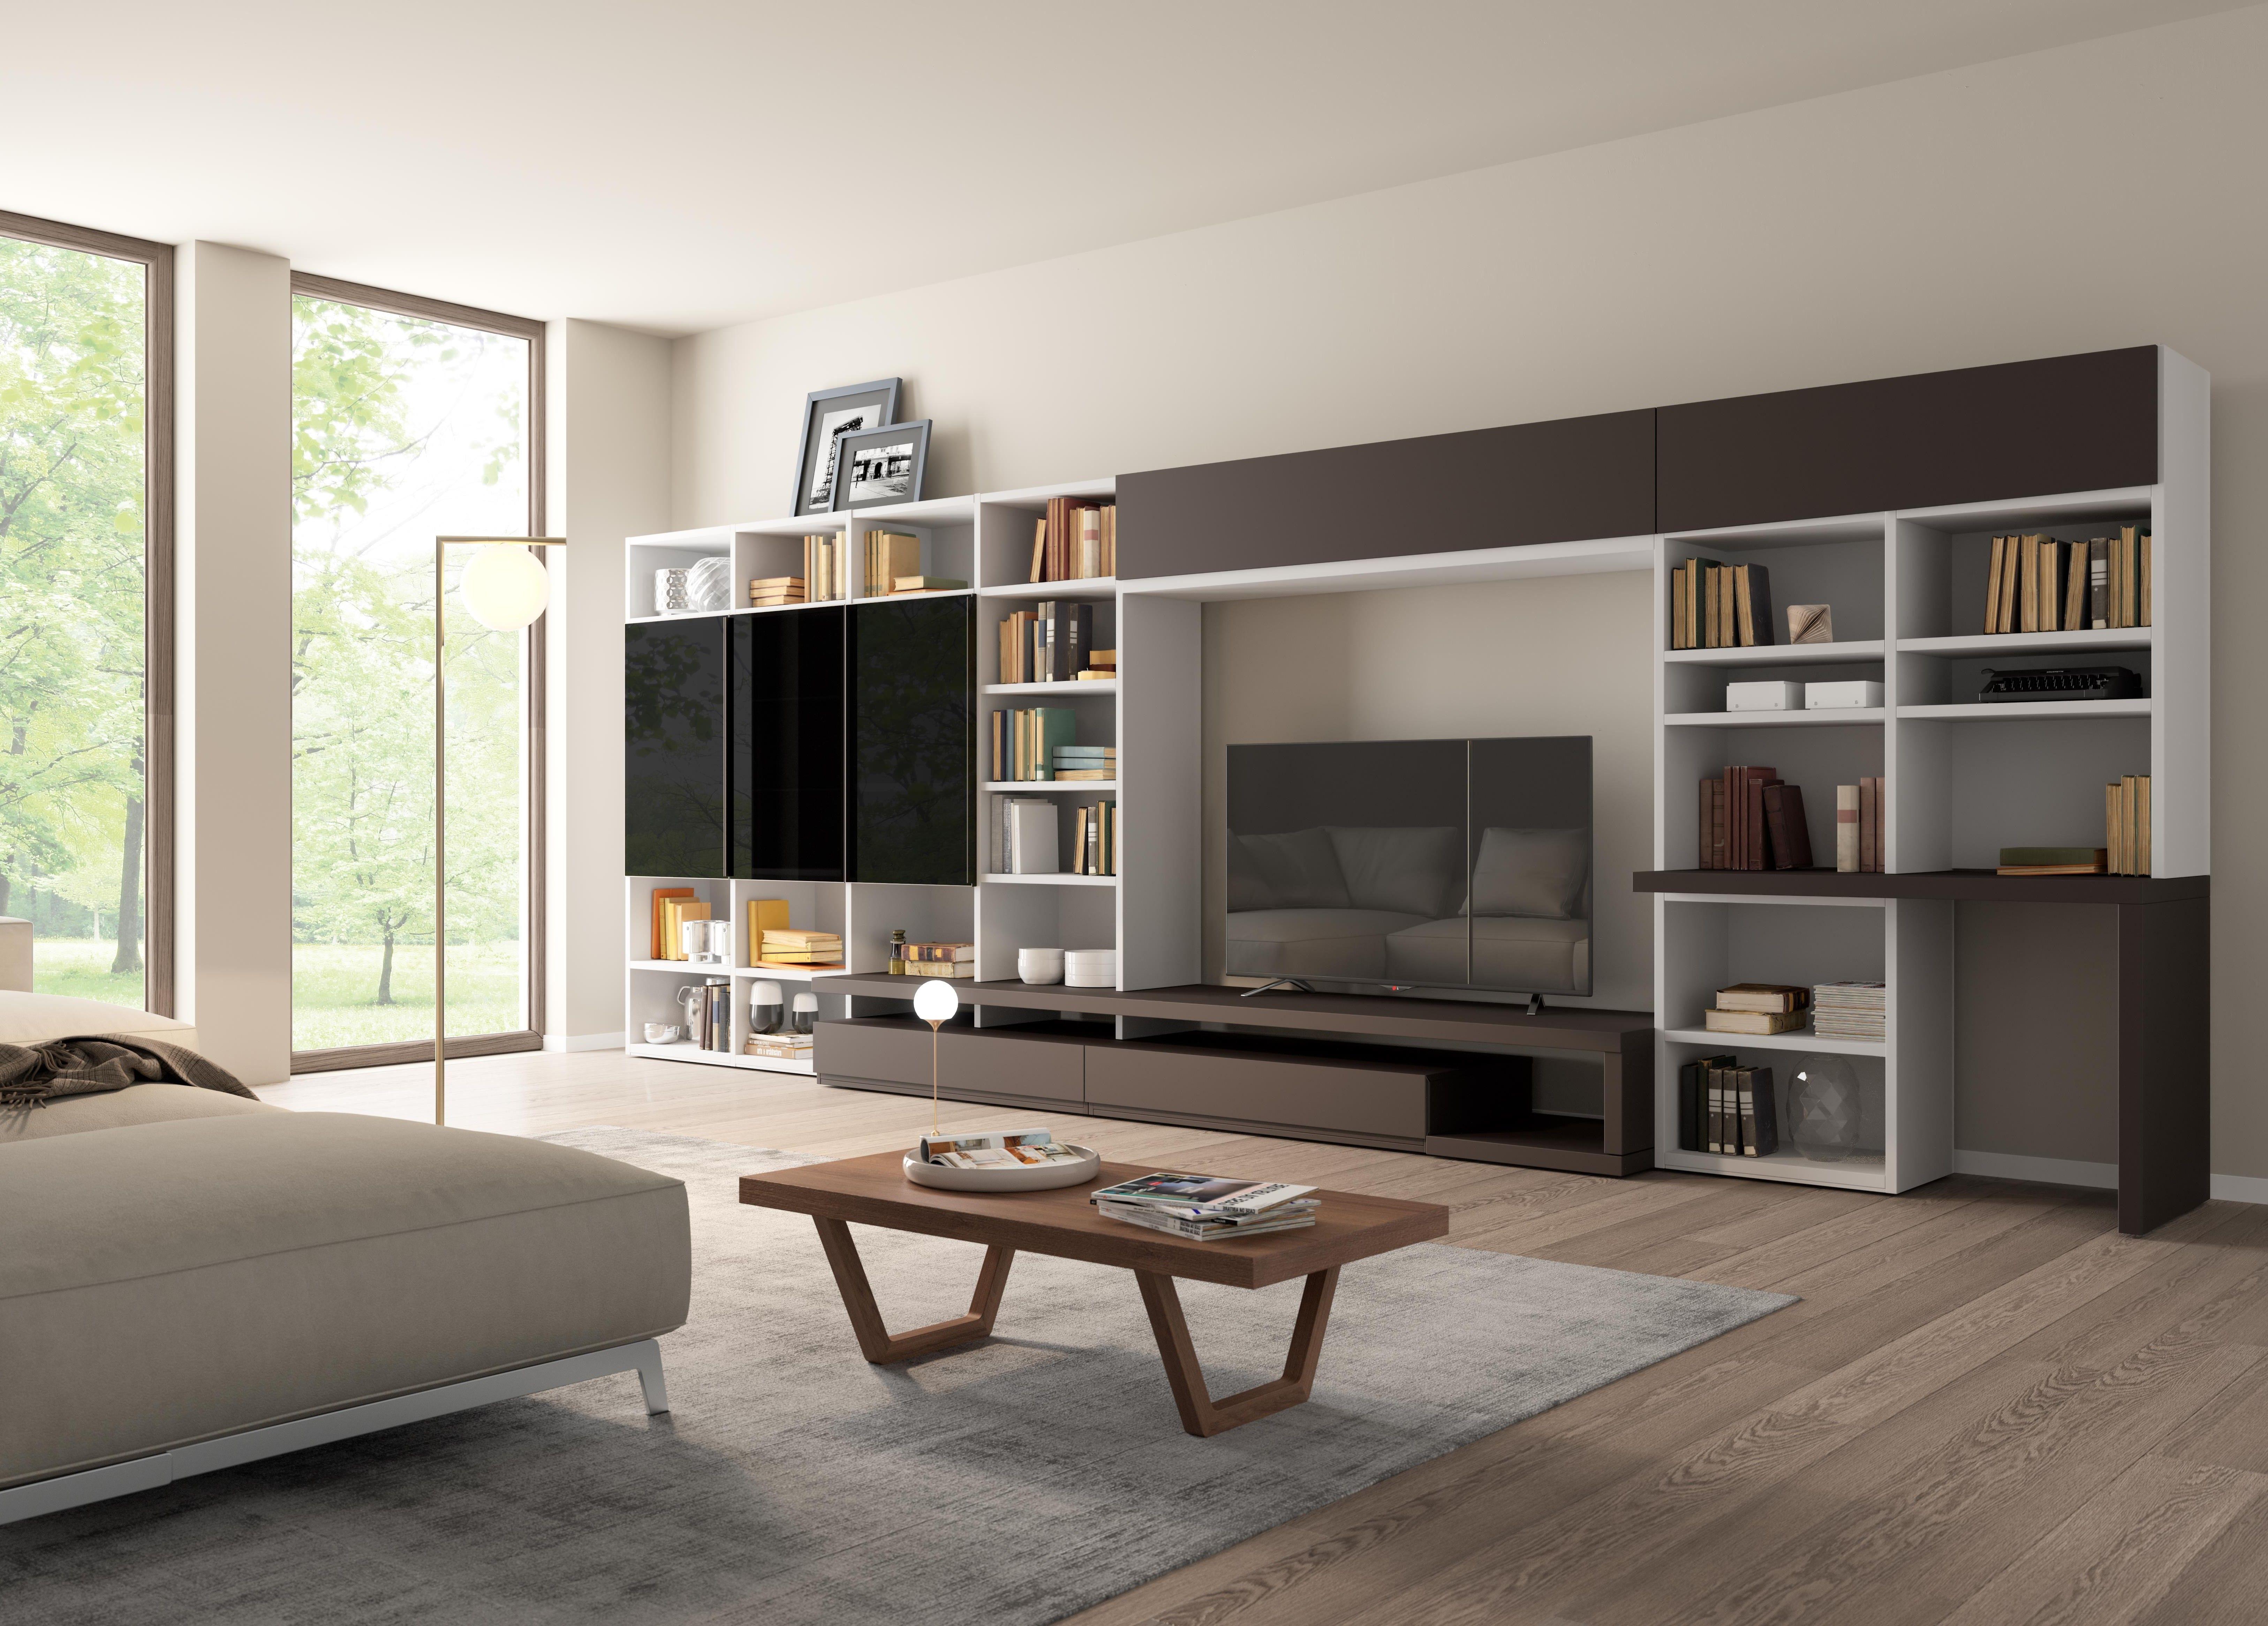 Pin di Giessegi su Living Cabina armadio, Uffici moderni